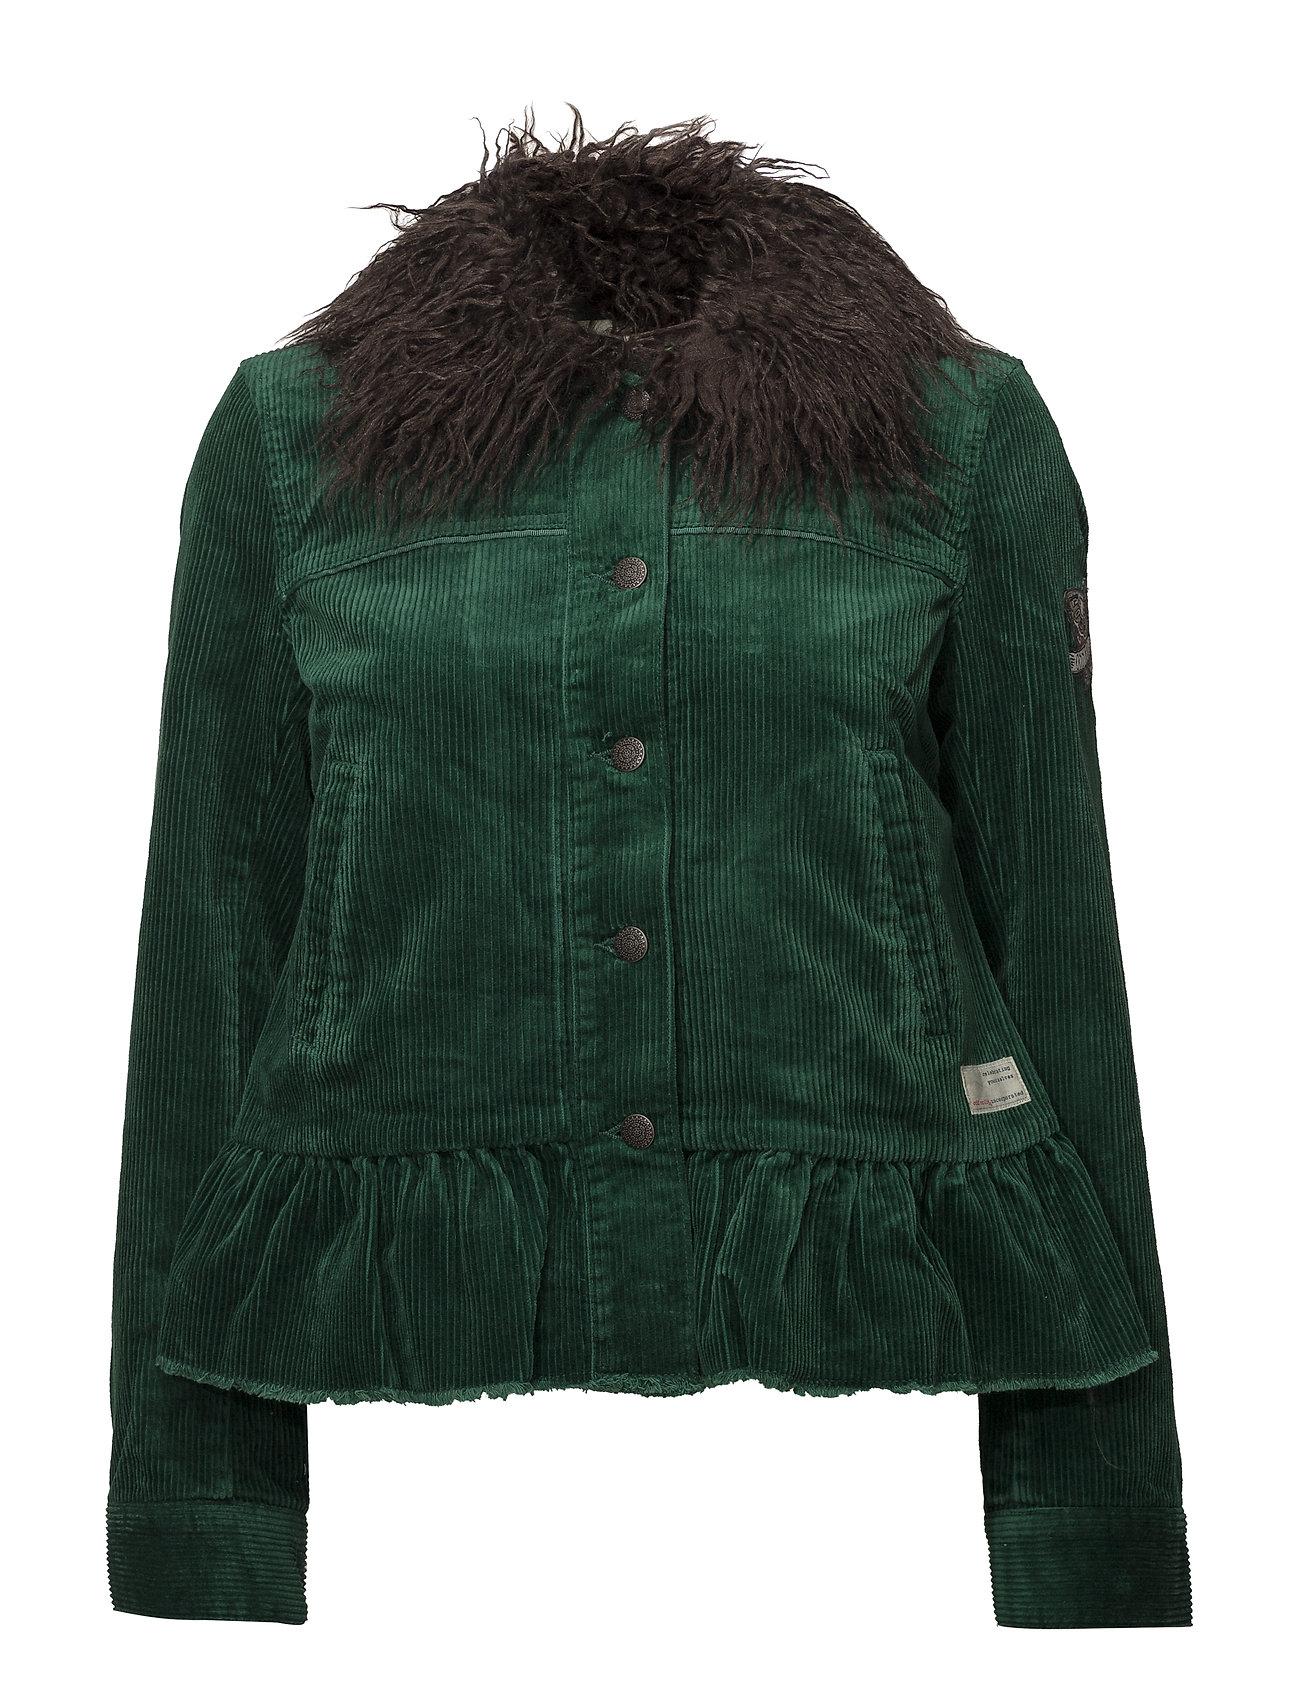 ODD MOLLY sincerely jacket